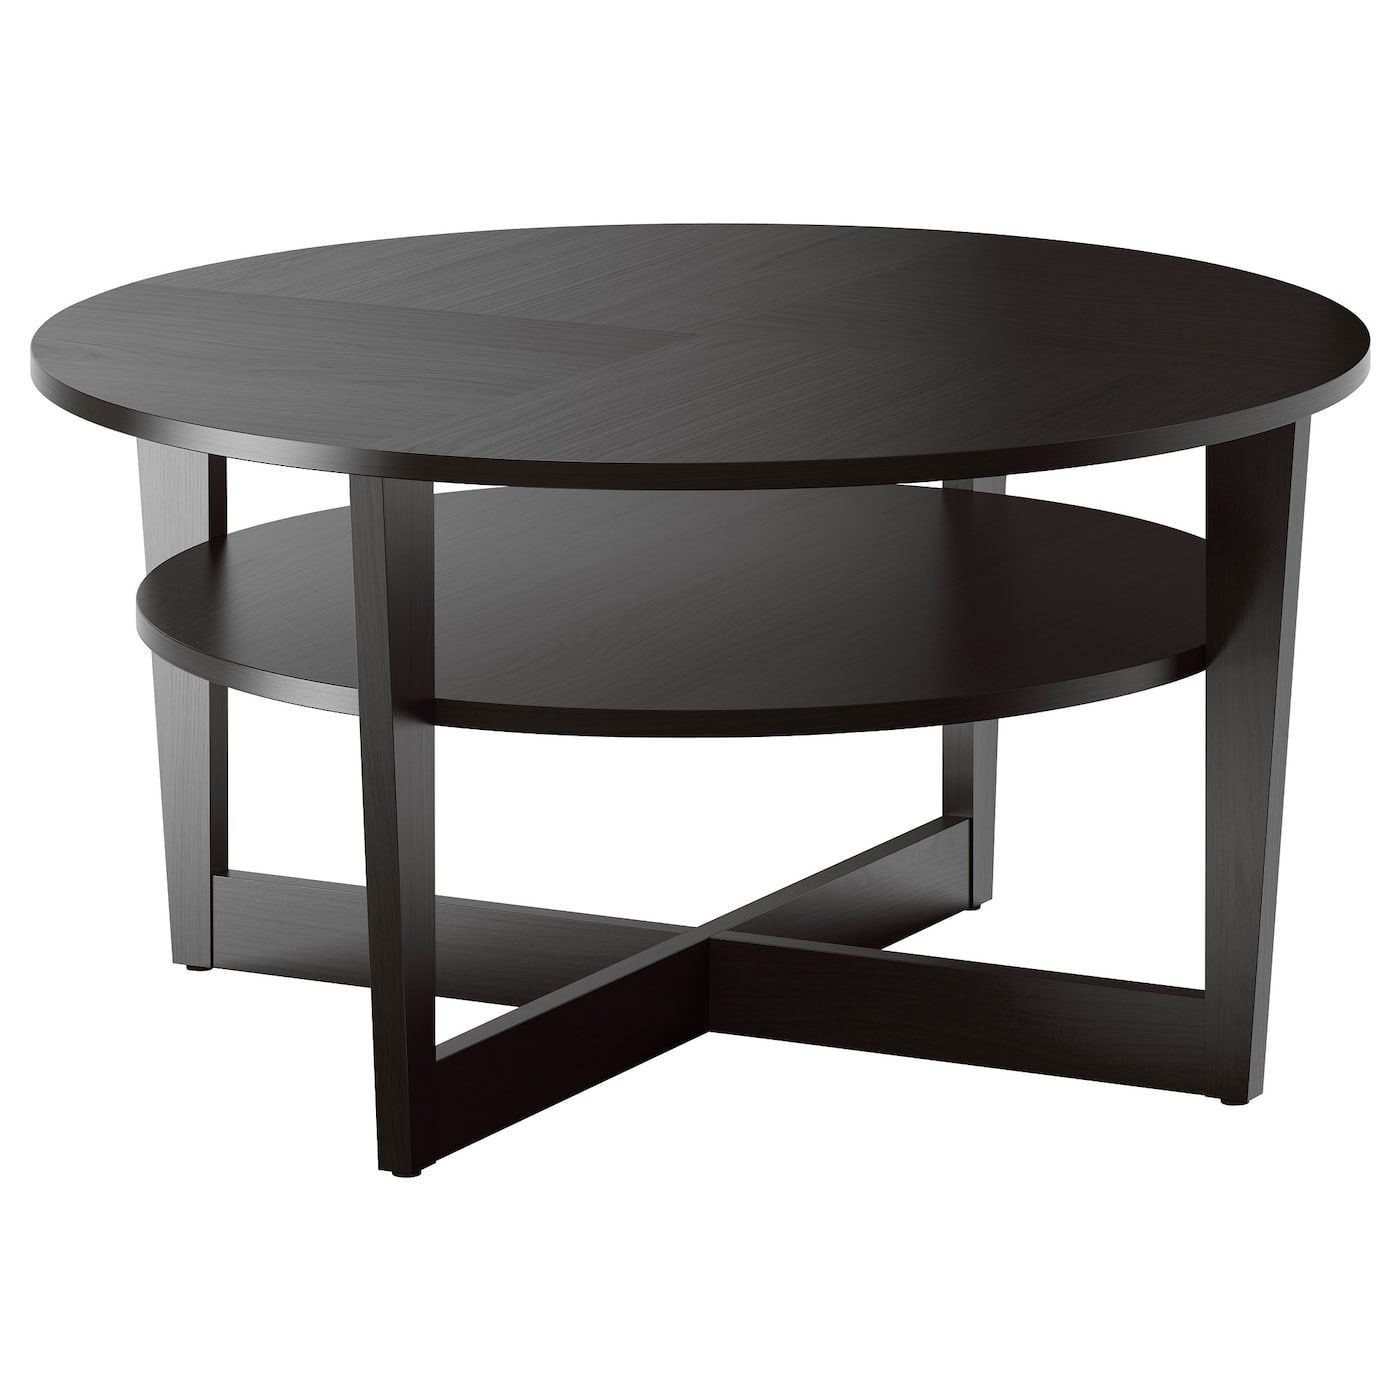 - US - Furniture And Home Furnishings Ikea Coffee Table, Coffee Table